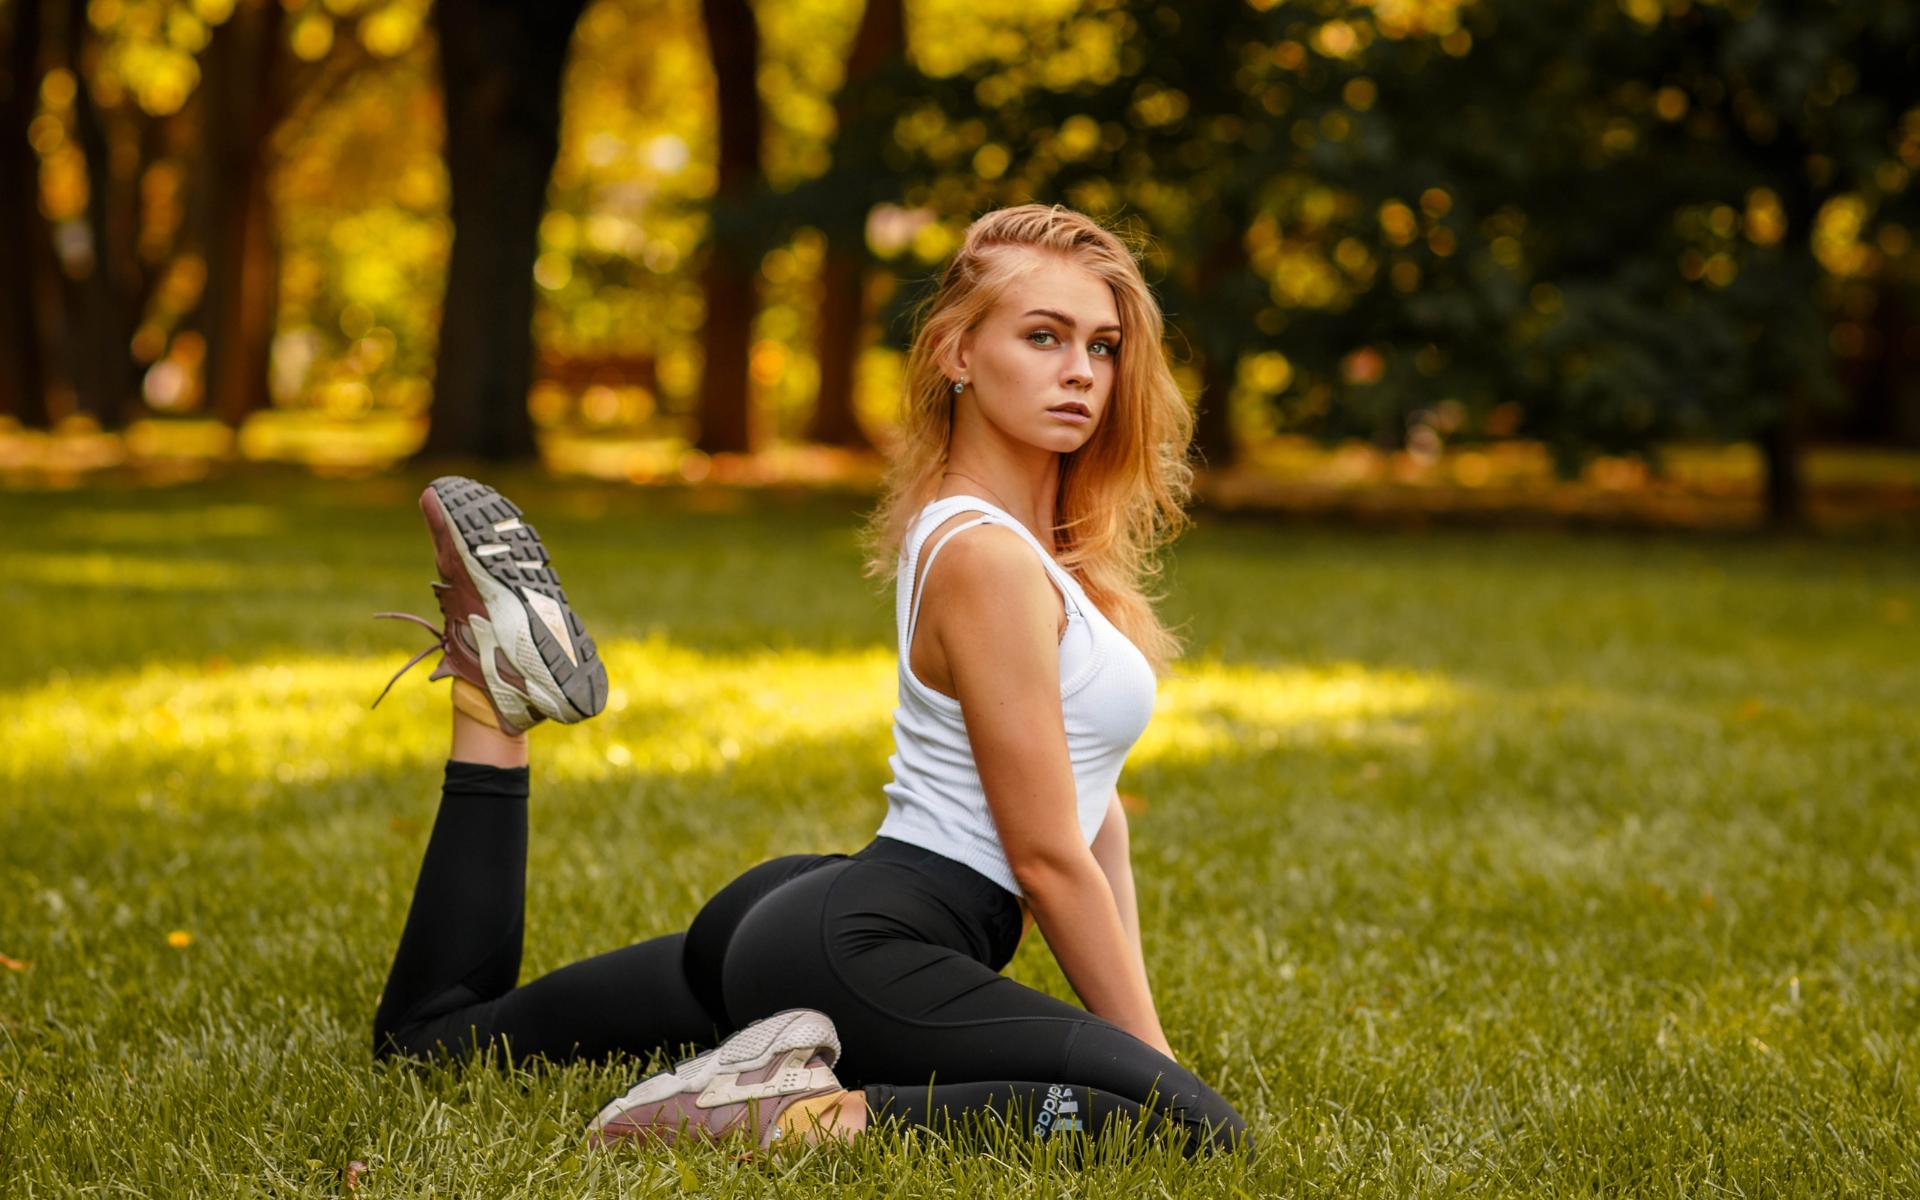 Wallpaper Women Yoga Pants Leggings Ass Cheeks Nature Blonde Looking At Viewer Depth Of Field Adidas 1920x1200 Da2nx 1723221 Hd Wallpapers Wallhere